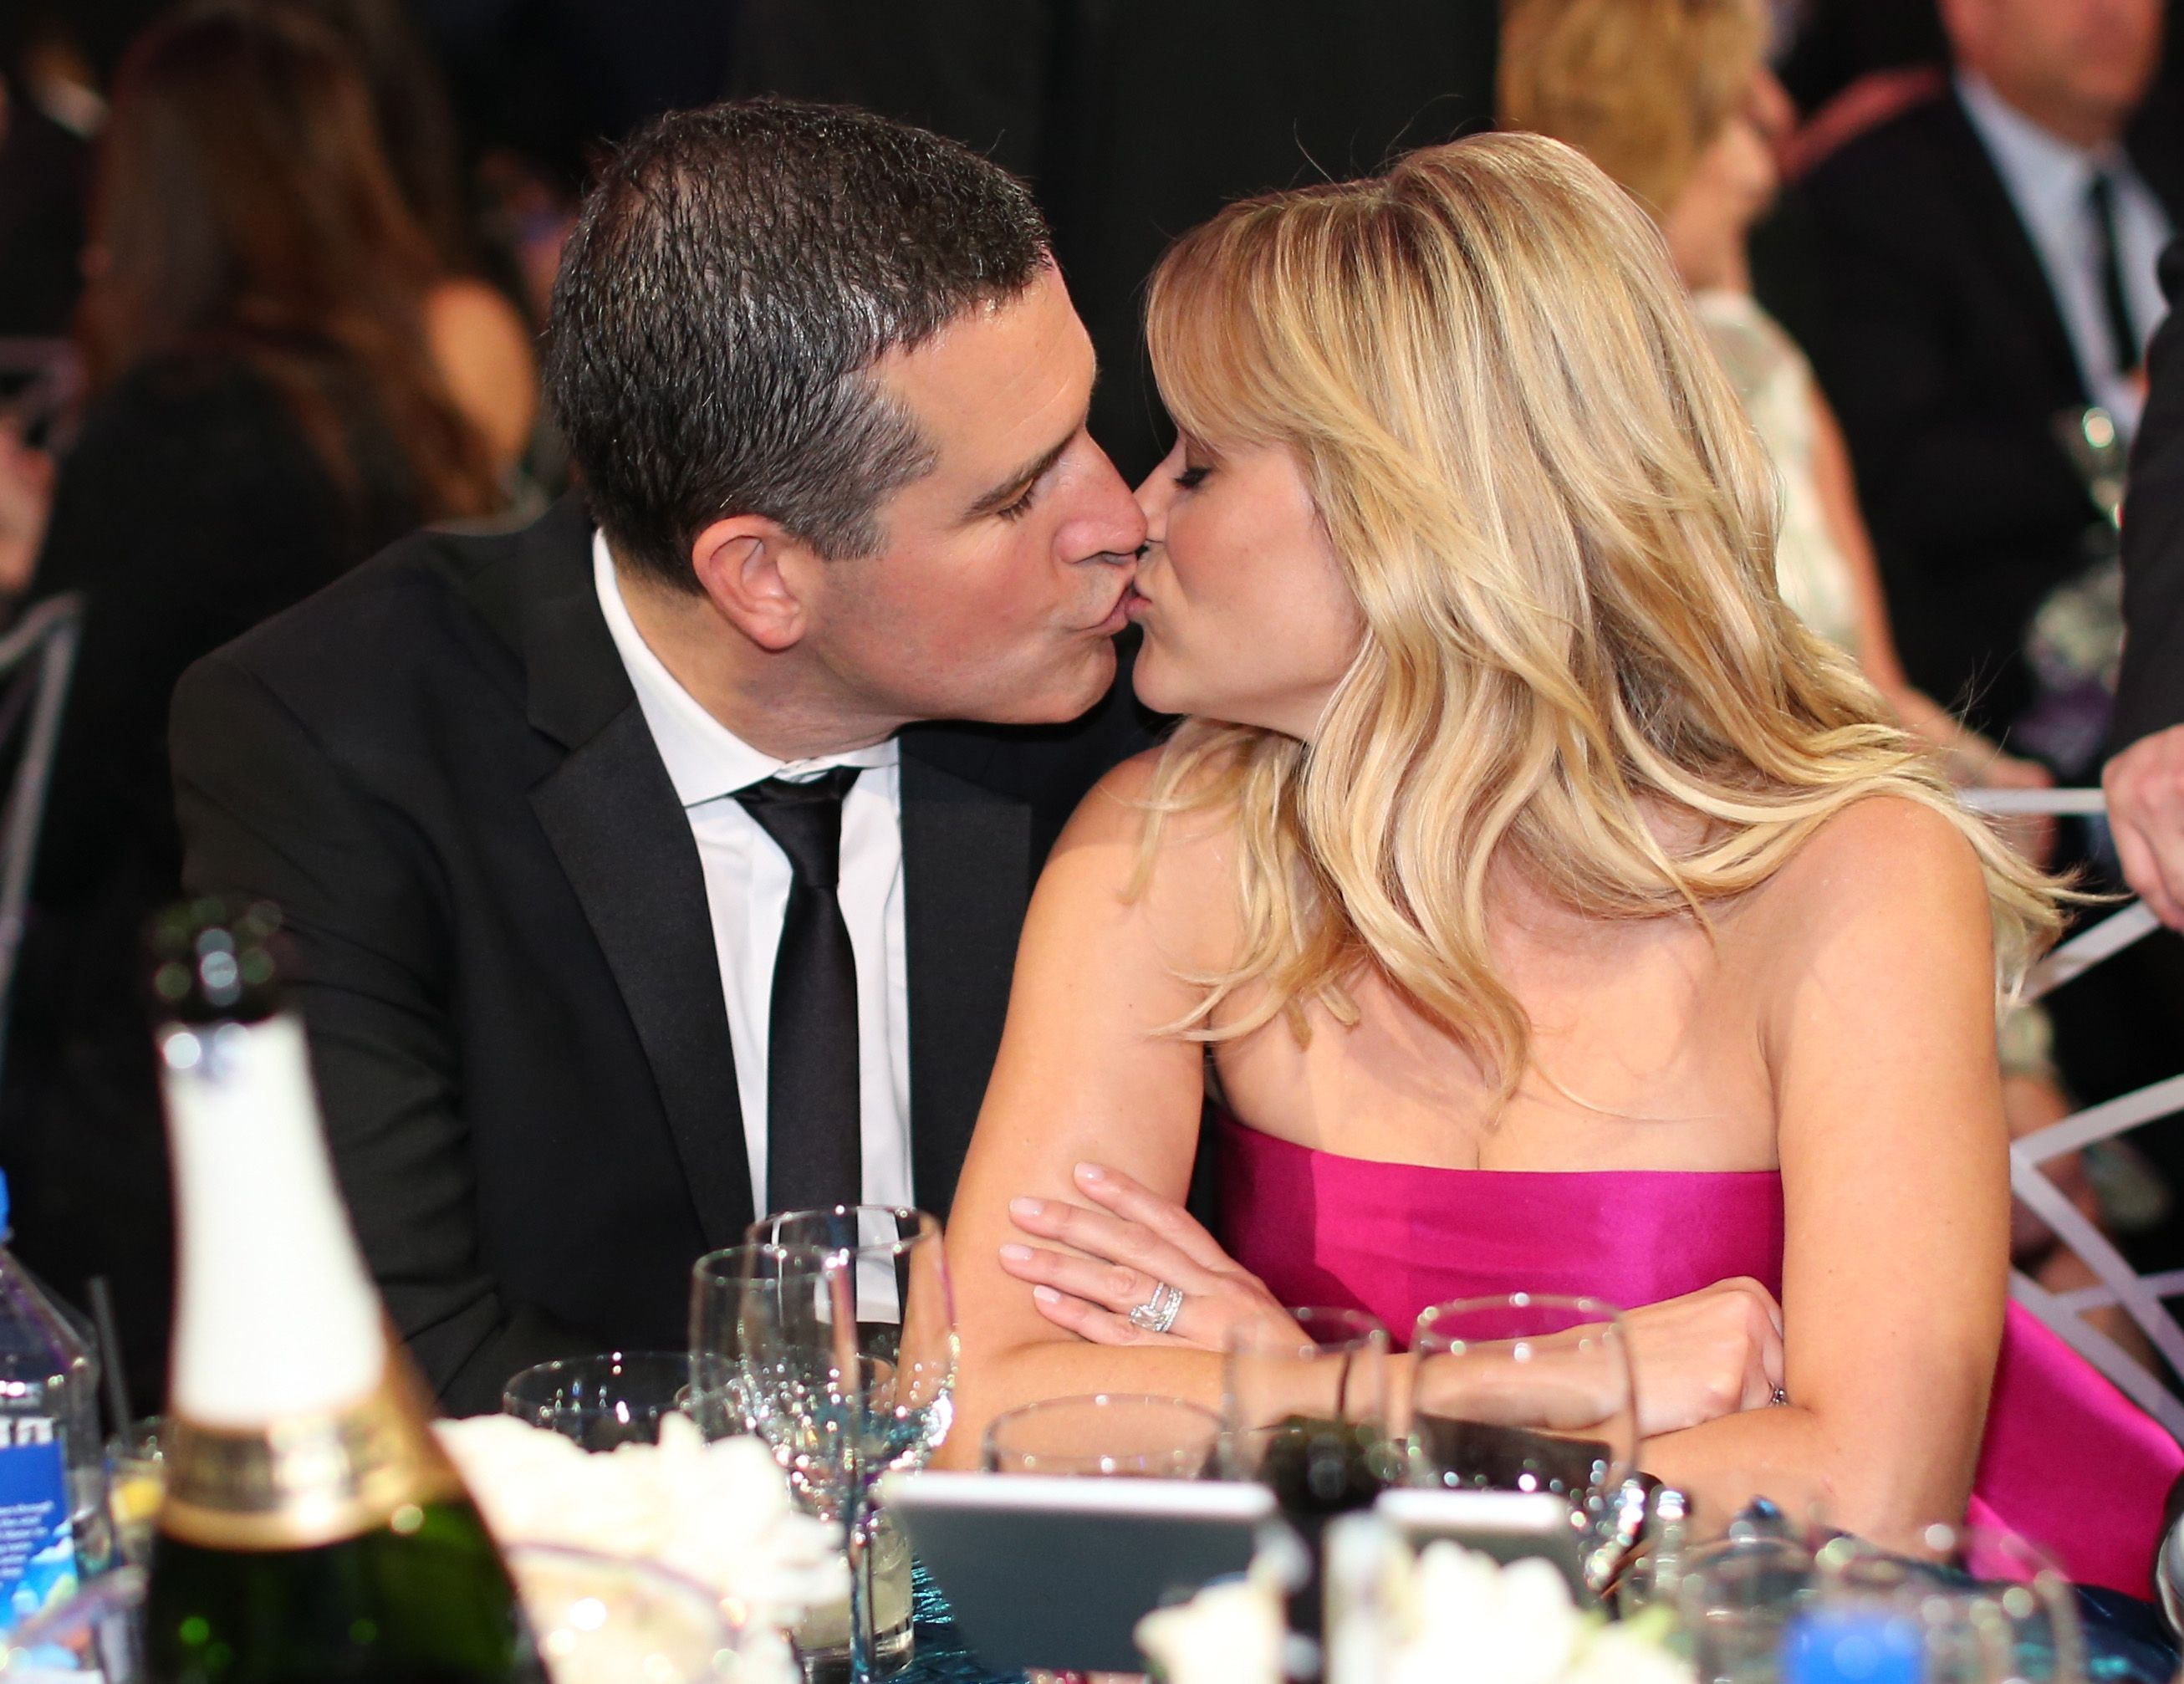 Reese Witherspoon Jim Toth dating smartplant instrumentering krok upp